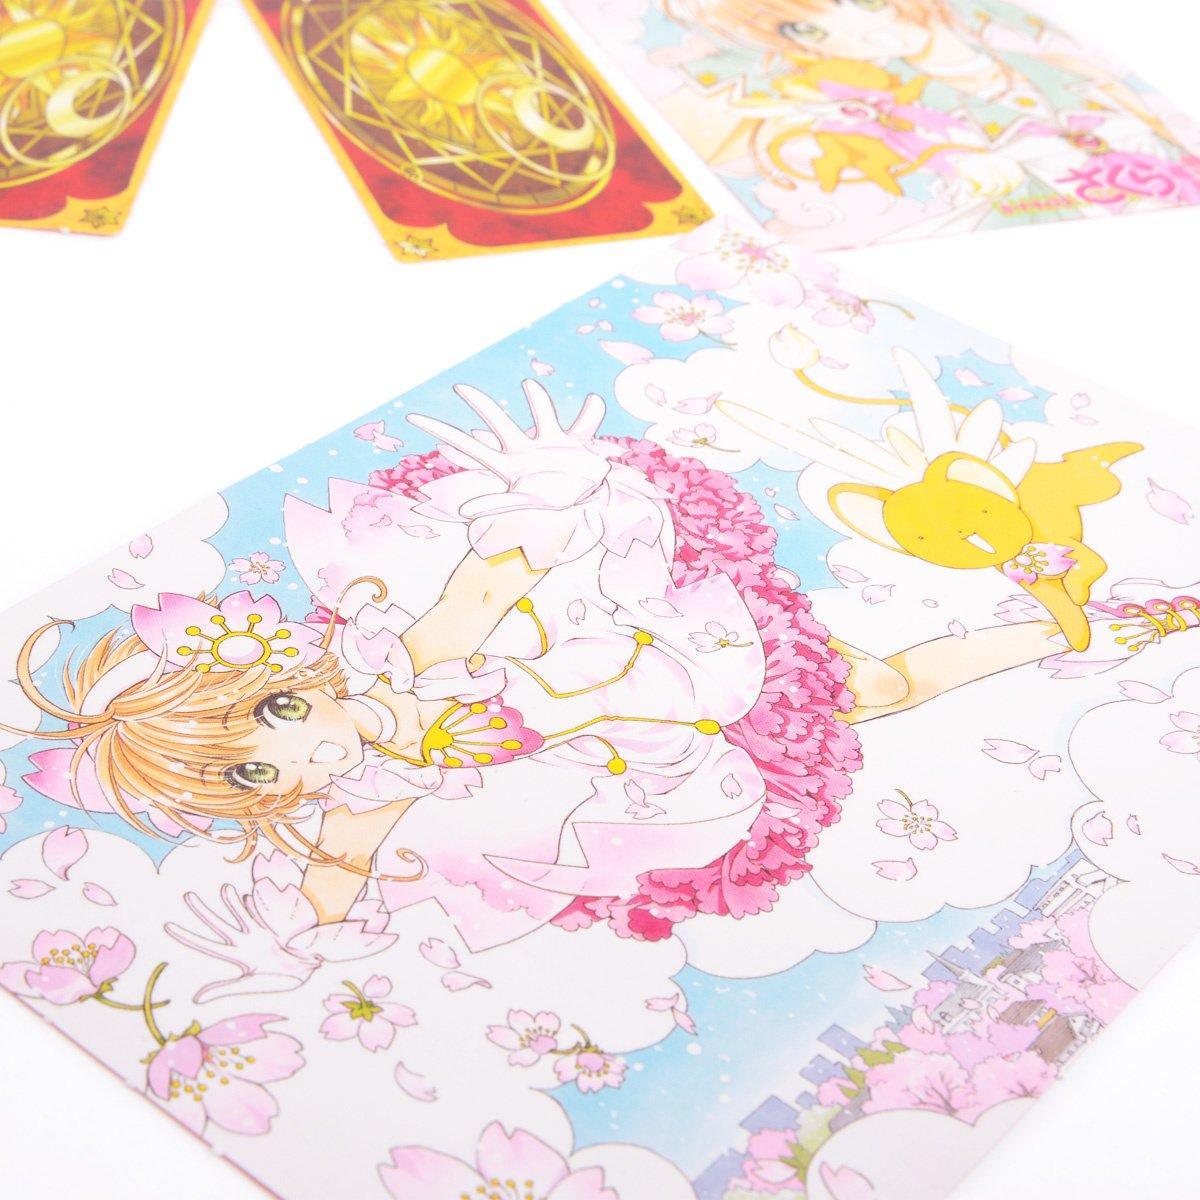 cardcaptor sakura clear card arc vol 1 deluxe edition w deluxe